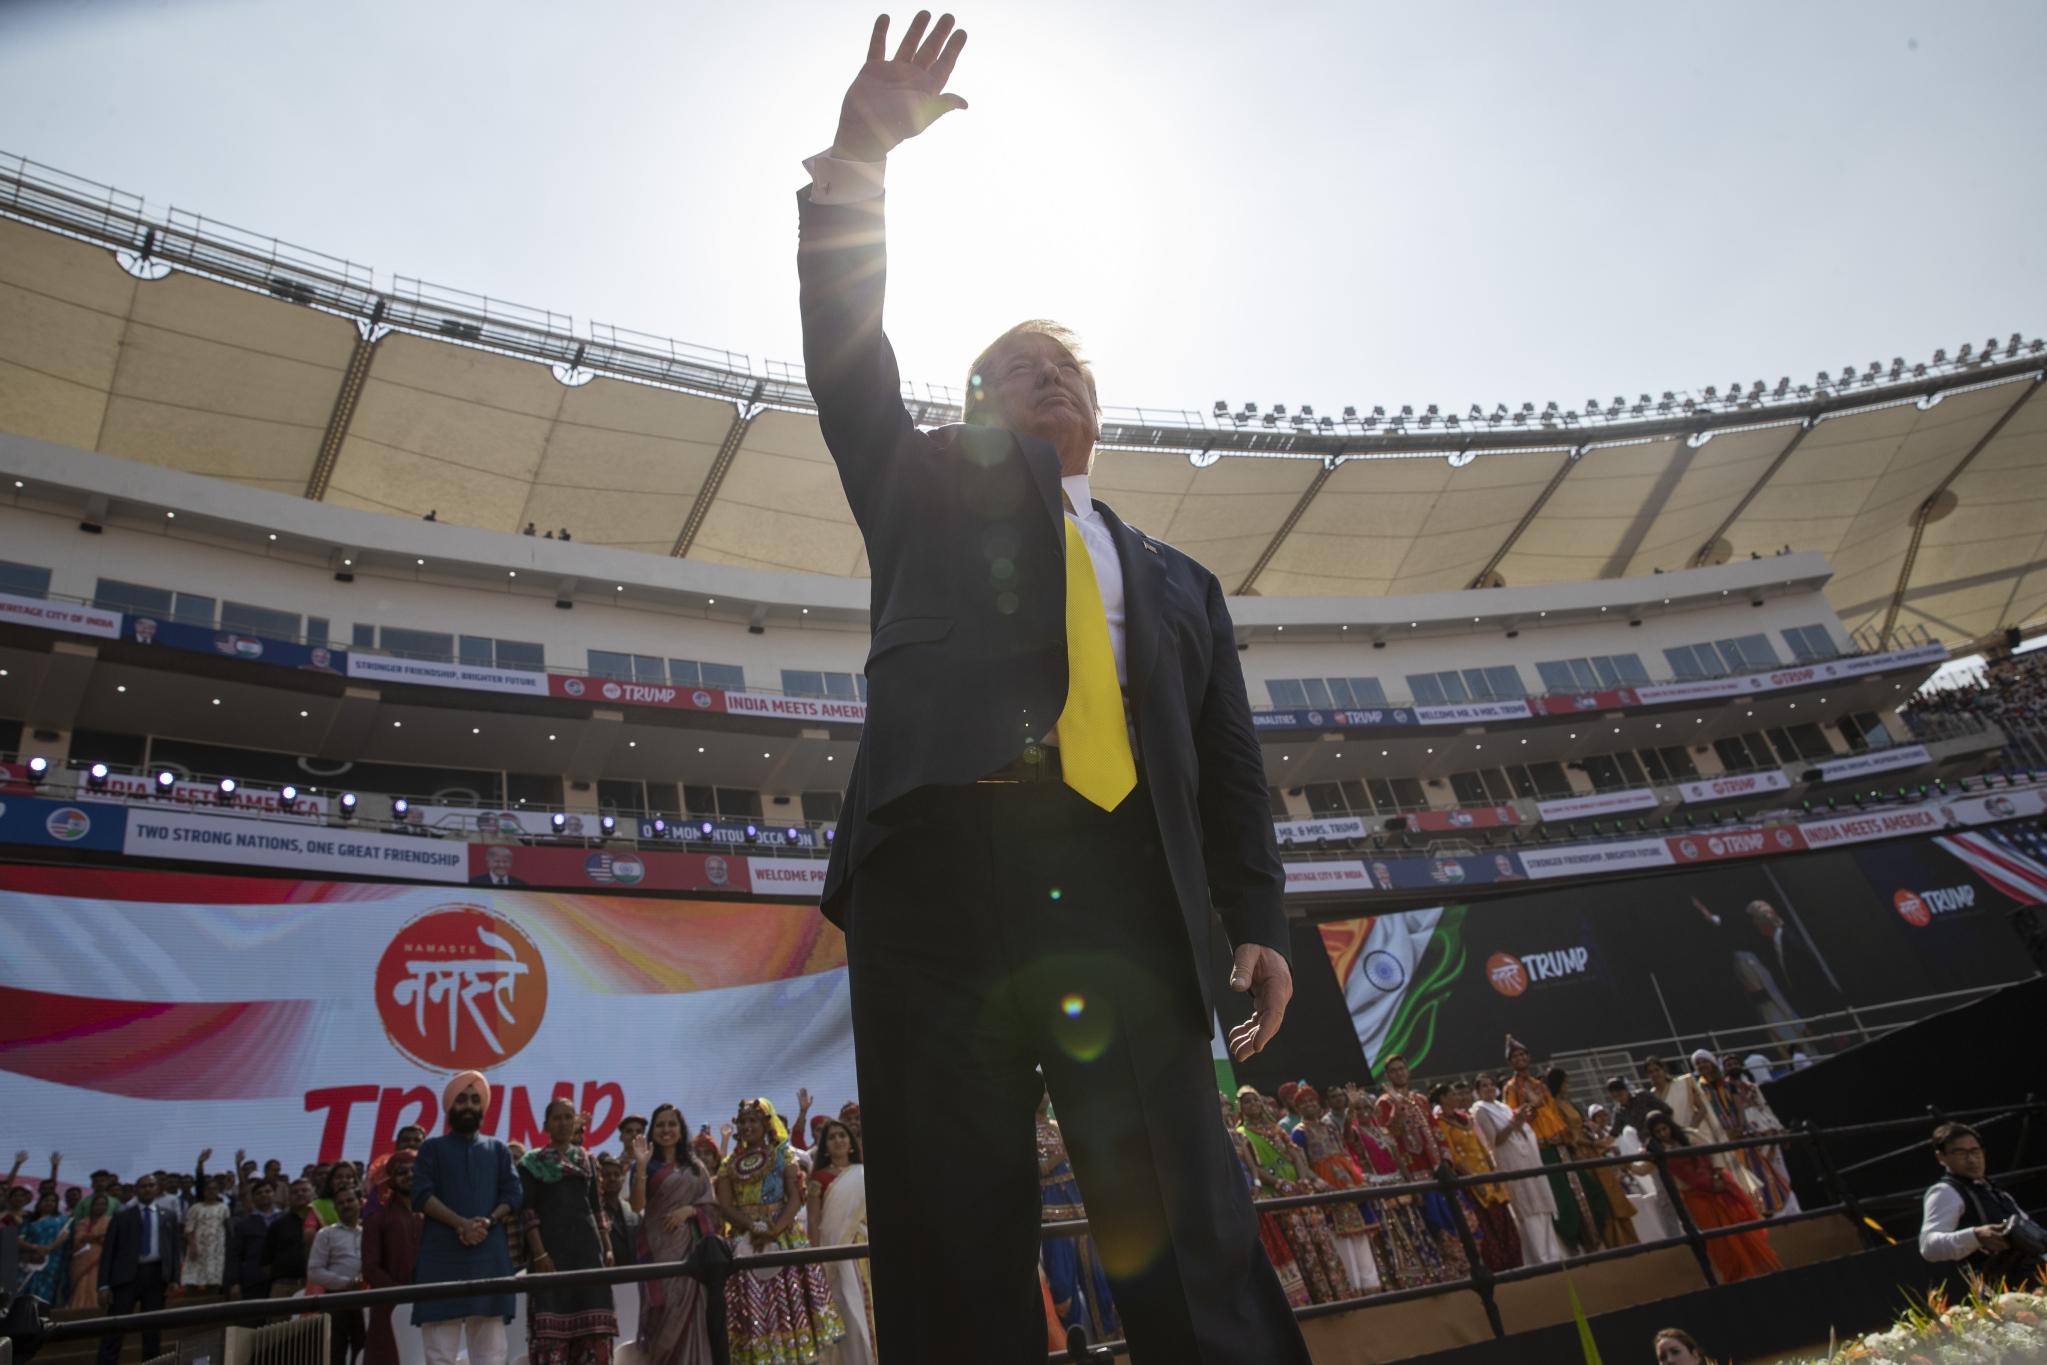 In Pics: India Celebrates US President Trump's Grand Arrival